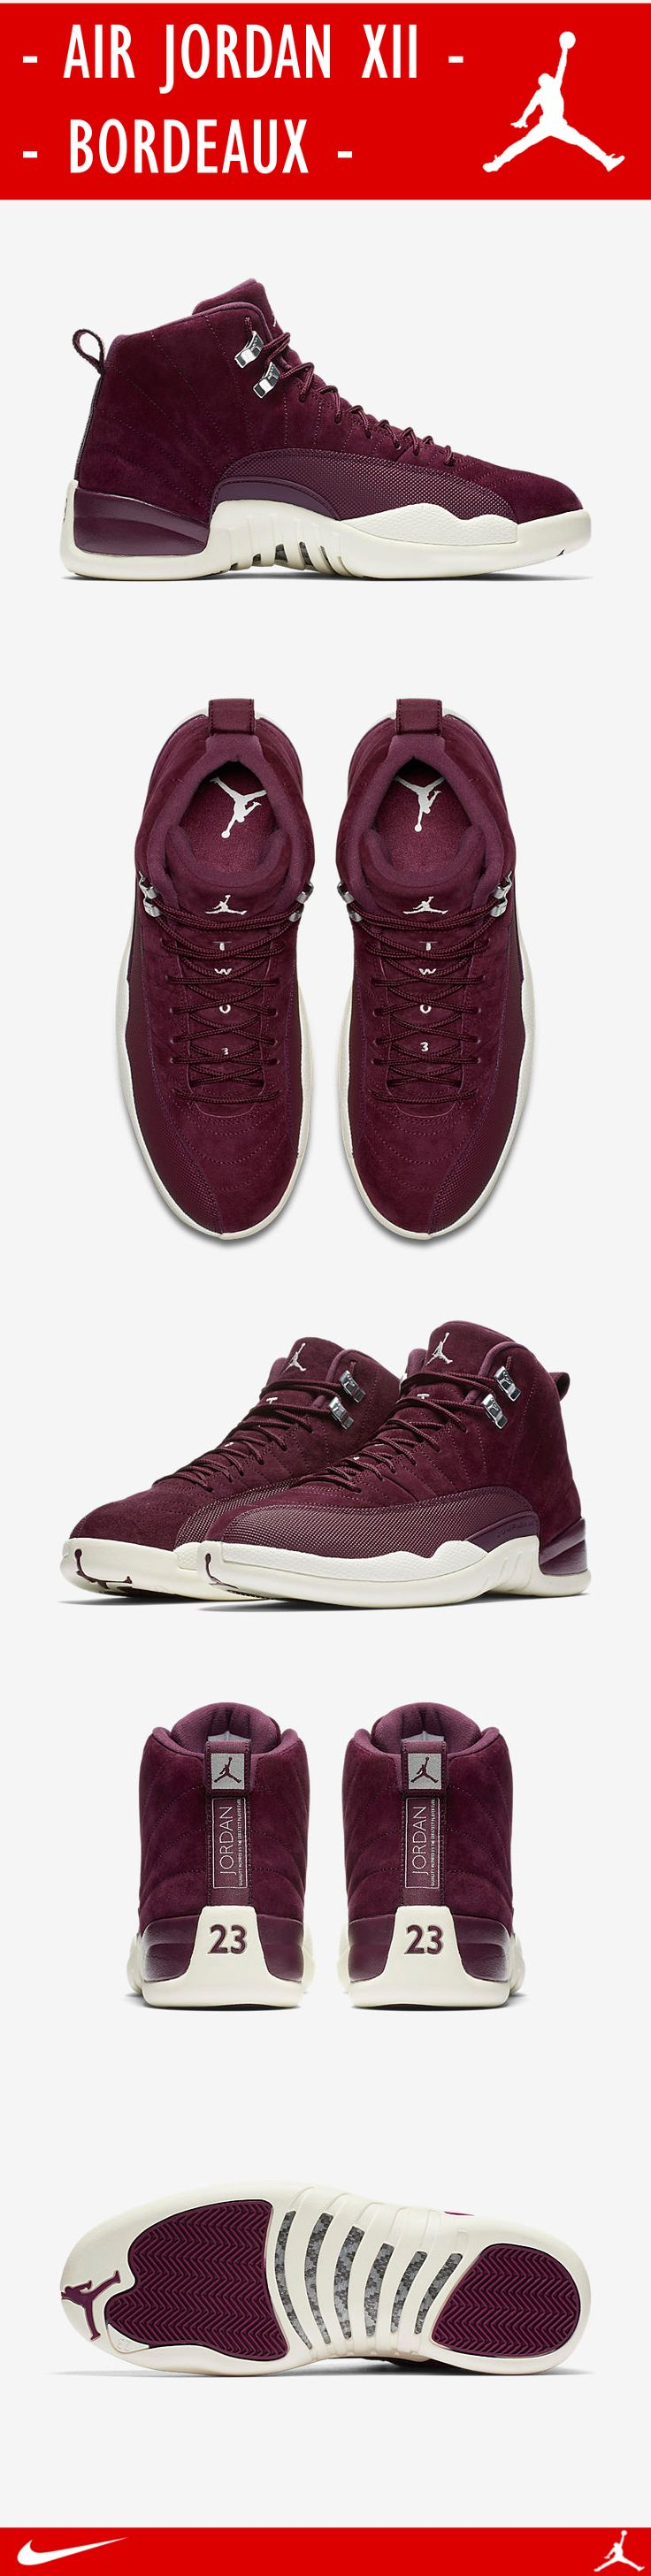 Nike Air Jordan XII - Bordeaux | Luxury Sneaker